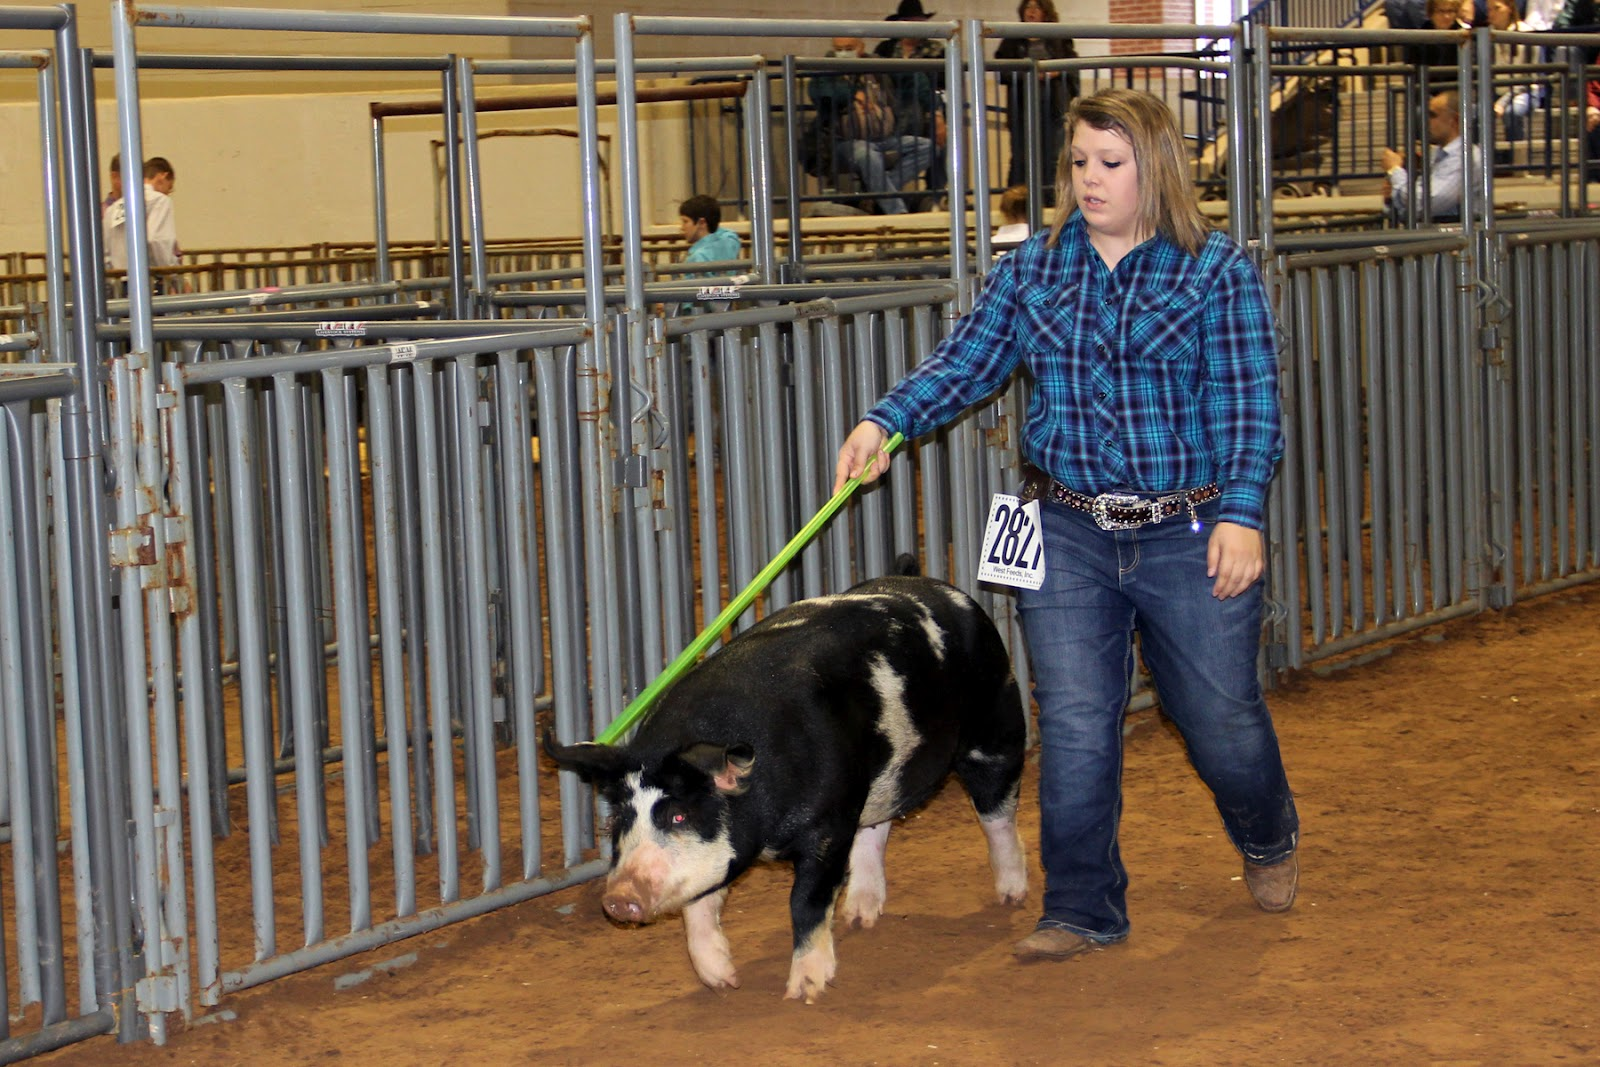 http://4.bp.blogspot.com/-R-9nHCP3Jqk/Tz68WptbZBI/AAAAAAAABqs/jtUxHQgQzg8/s1600/County+Livestock+Show+swine+and+steers+2012+041+adj4x6.jpg